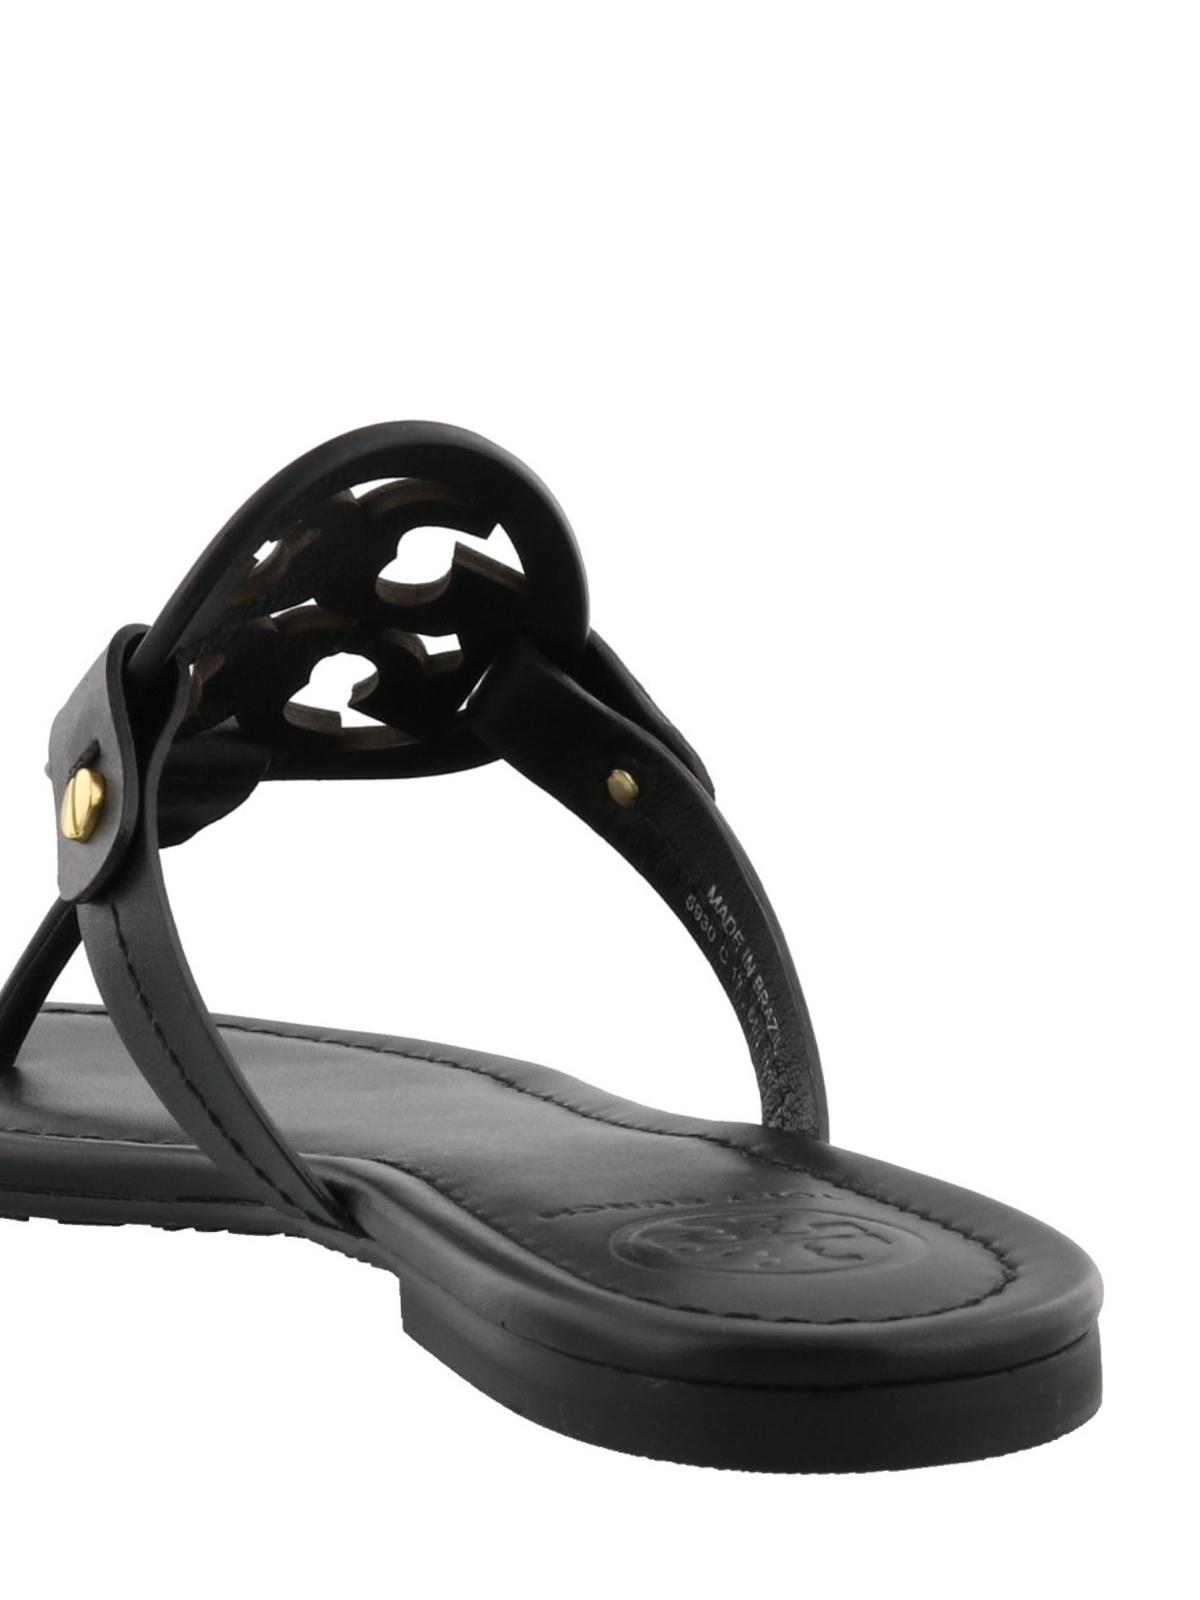 9384d7aba477 Tory Burch - Miller black leather thong sandals - flip flops ...